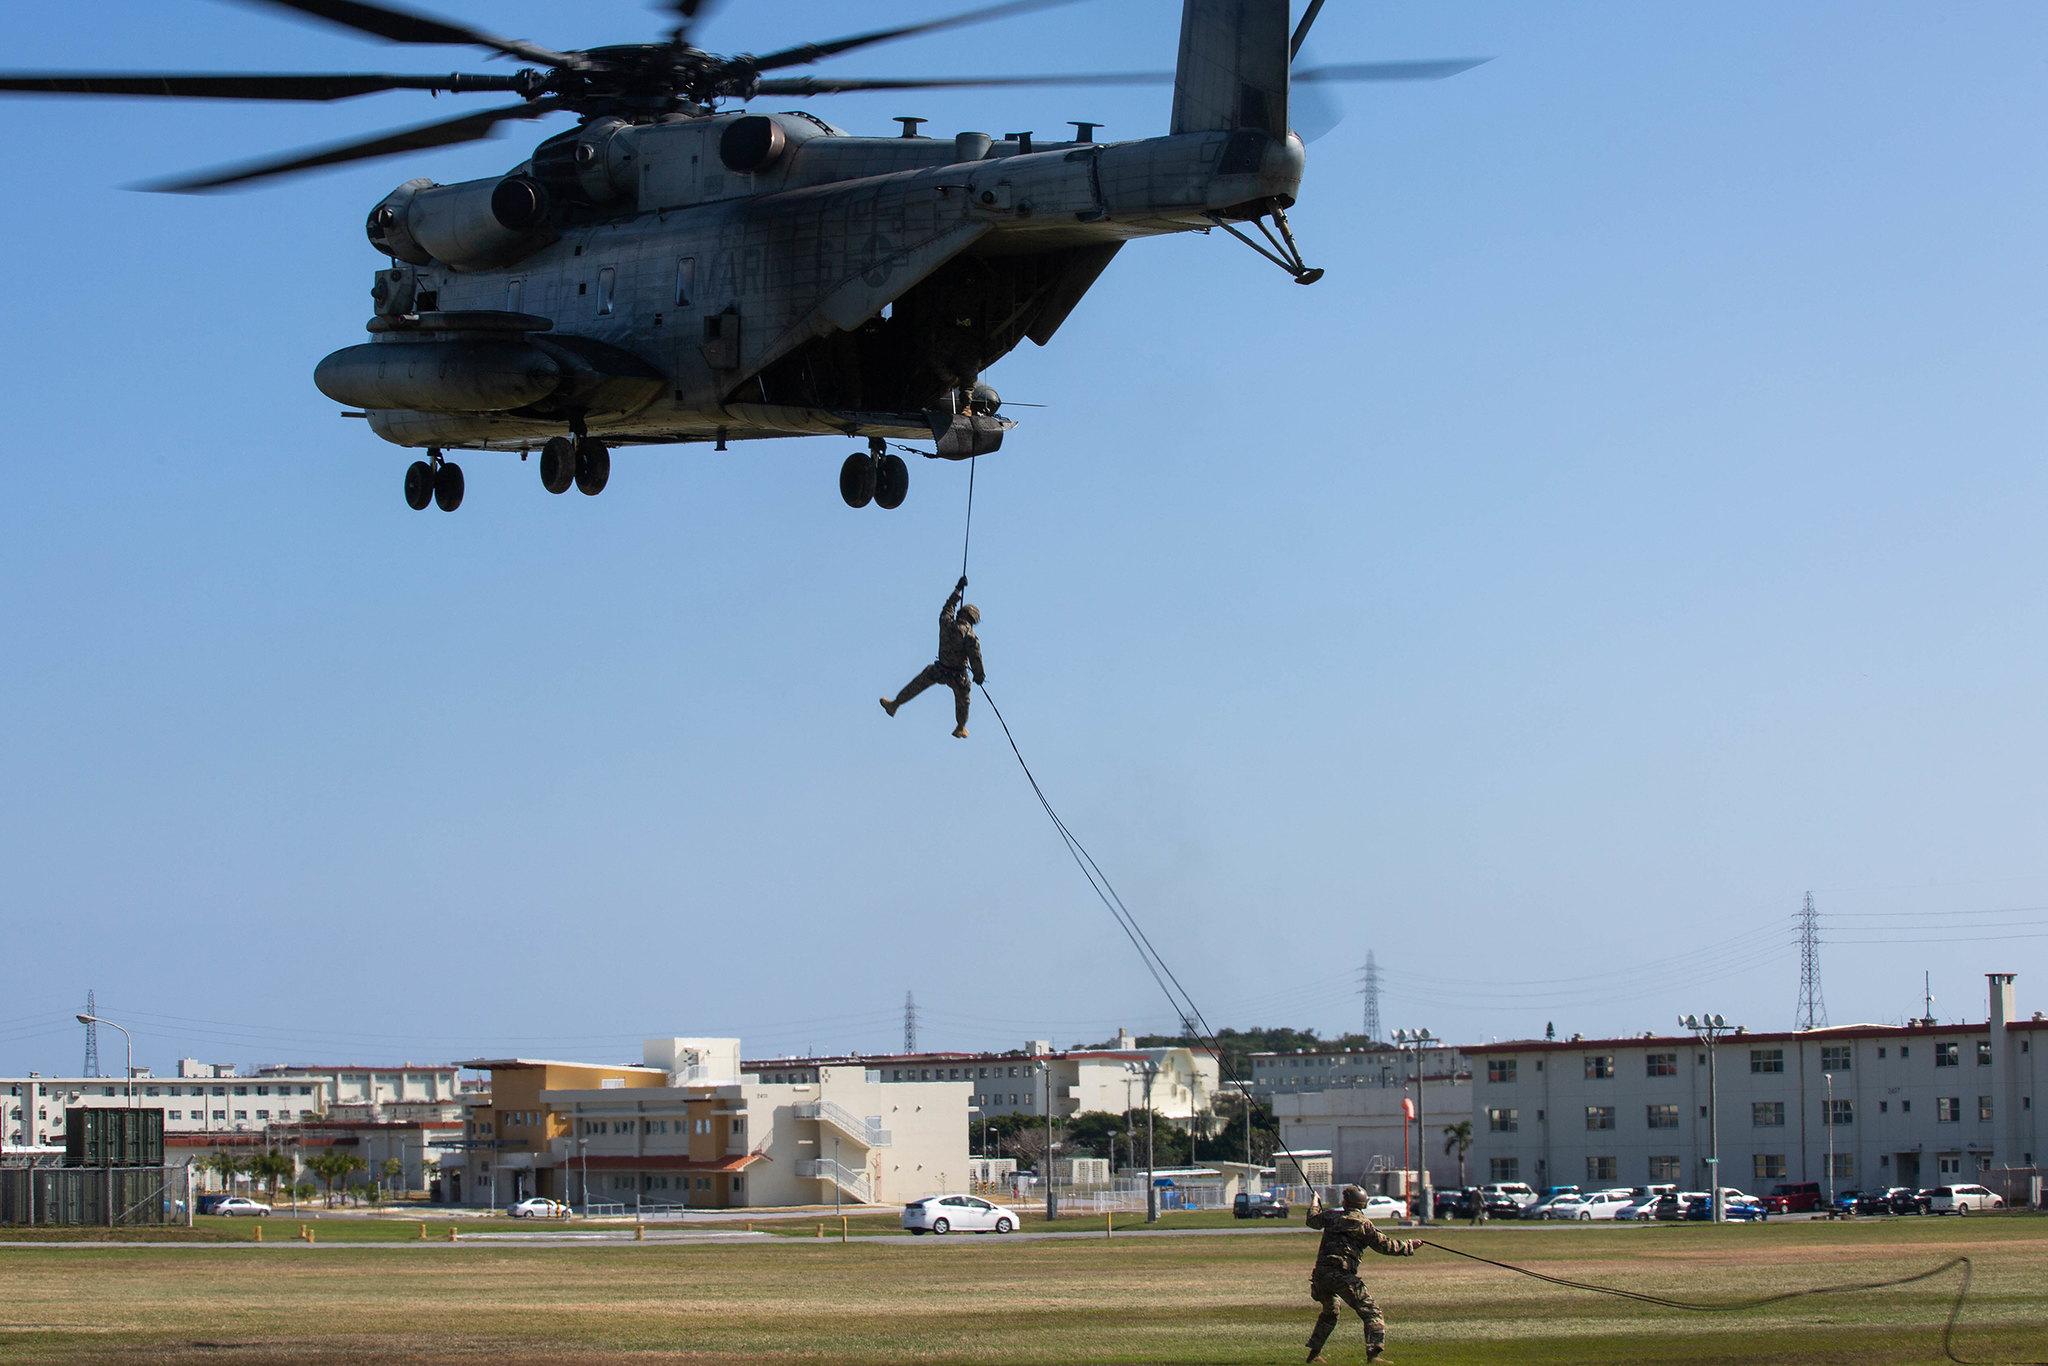 U.S. Marines rappel off a CH-53E Super Stallion helicopter on Camp Hansen, Okinawa, Japan, Jan. 14, 2020. (Lance Cpl. Jackson Dukes/Marine Corps)